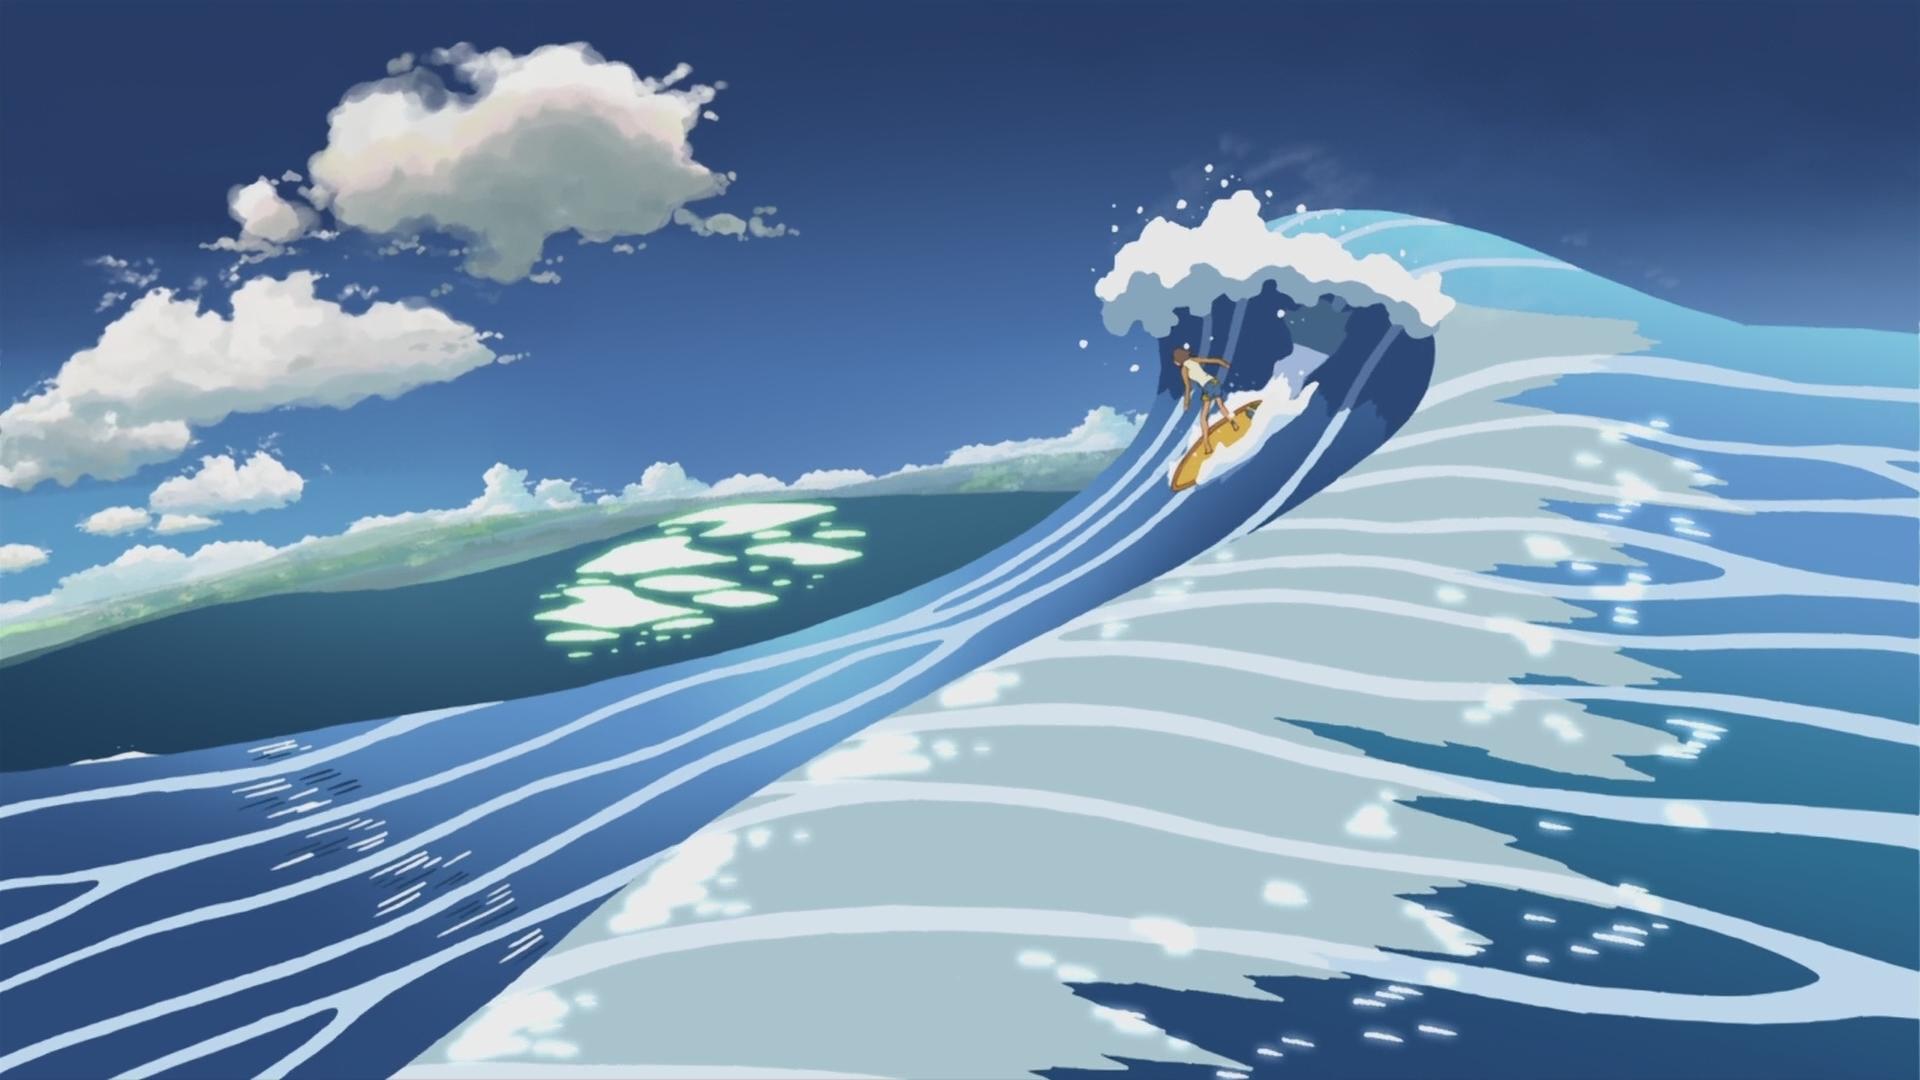 Surfing Makoto Shinkai 5 Centimeters Per Second Artwork - 5 Centimeters Per Second Surf , HD Wallpaper & Backgrounds